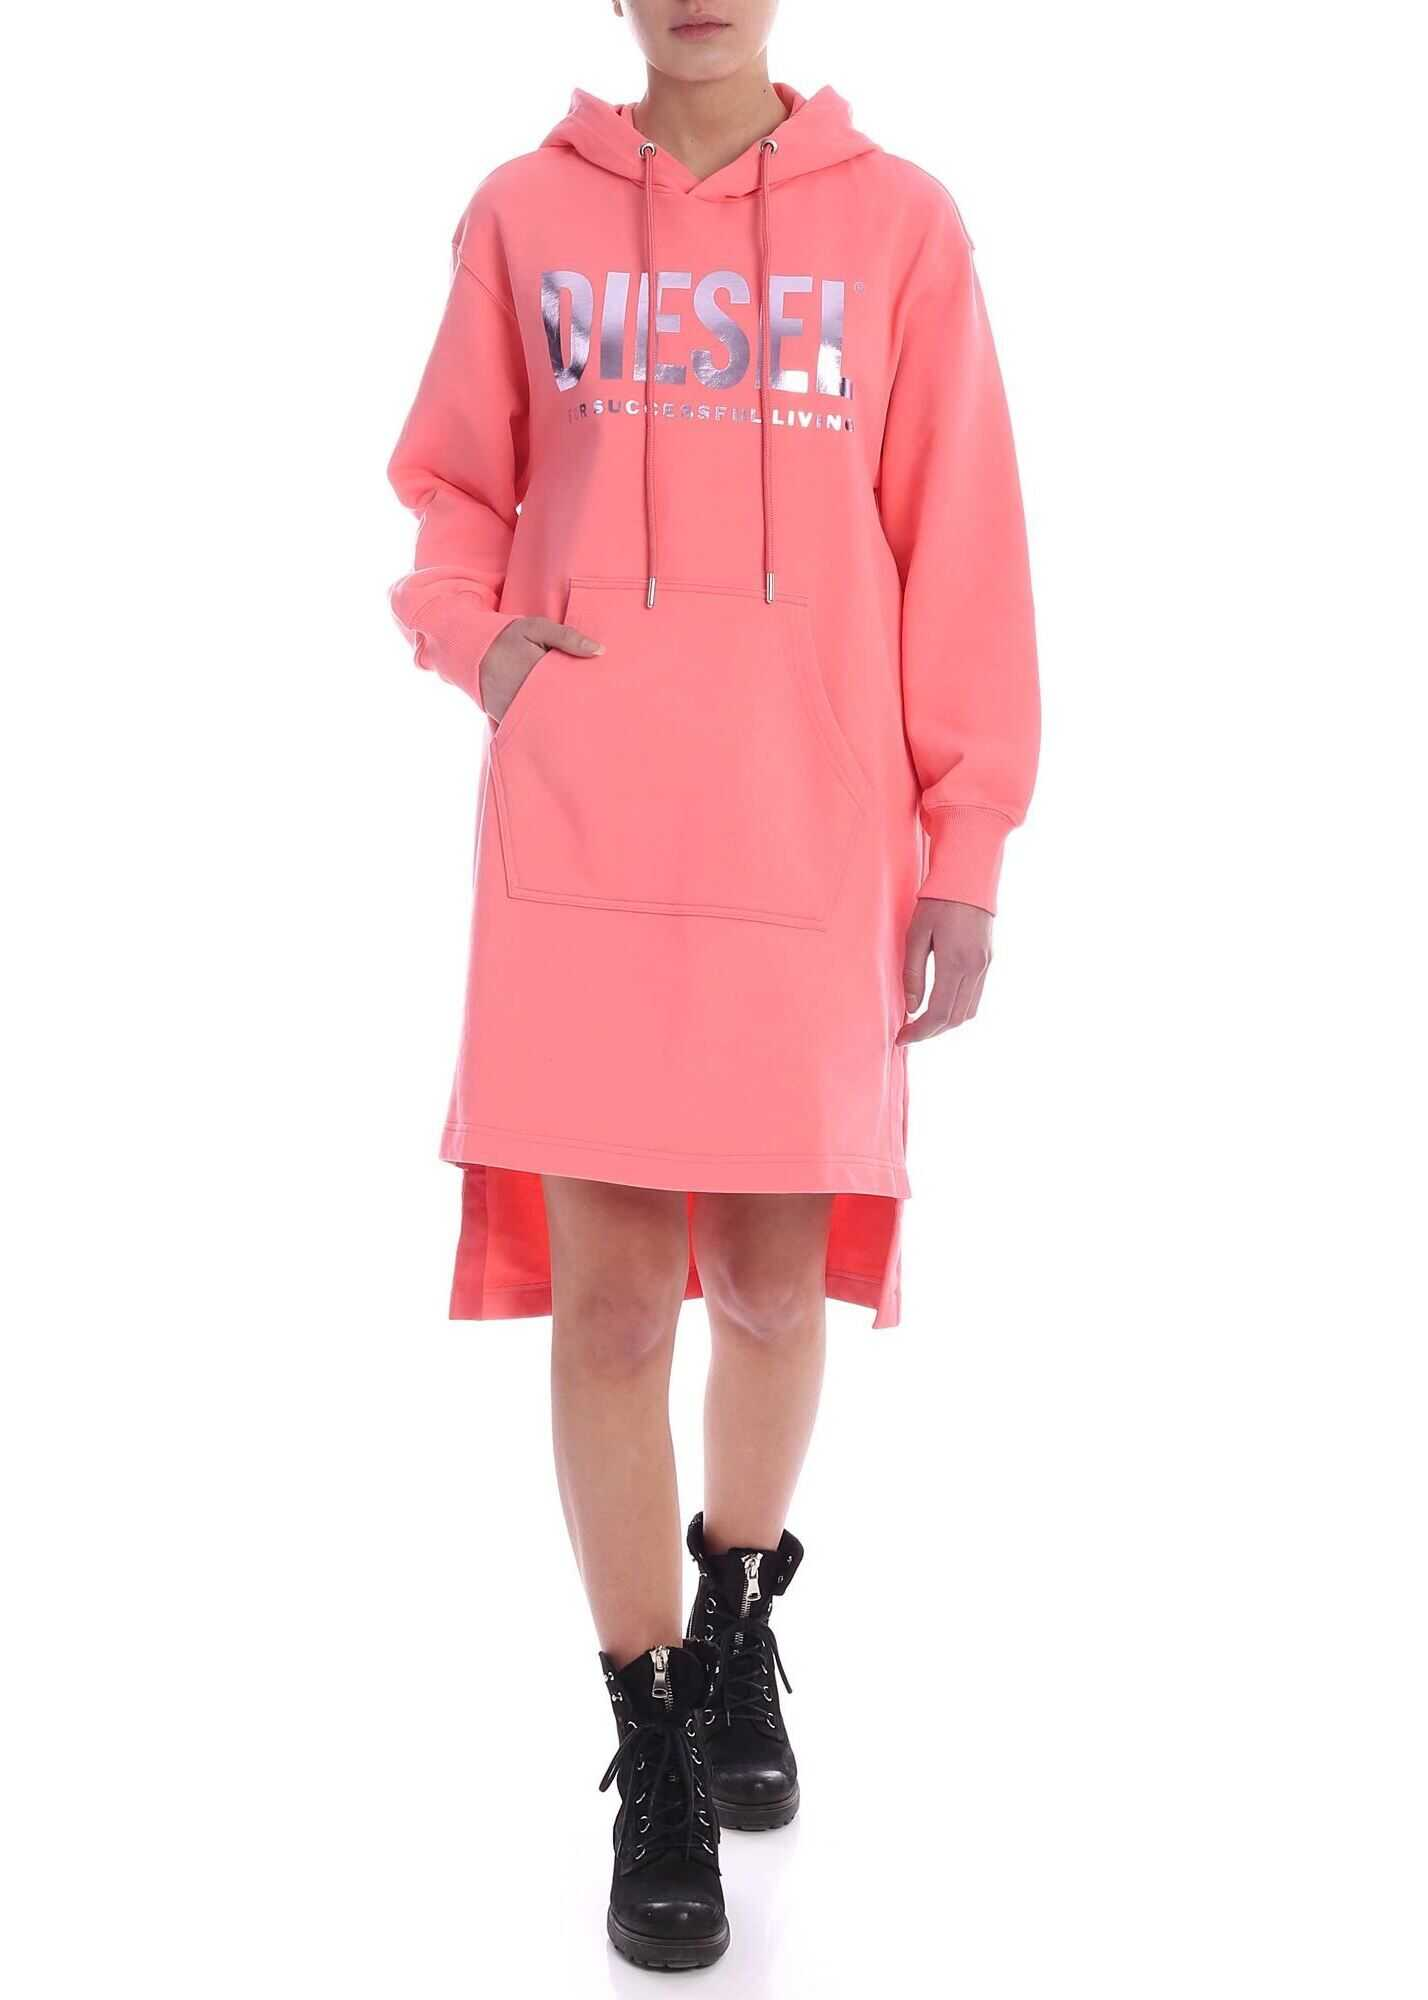 Diesel Ilse-T Dress In Salmon Pink Pink